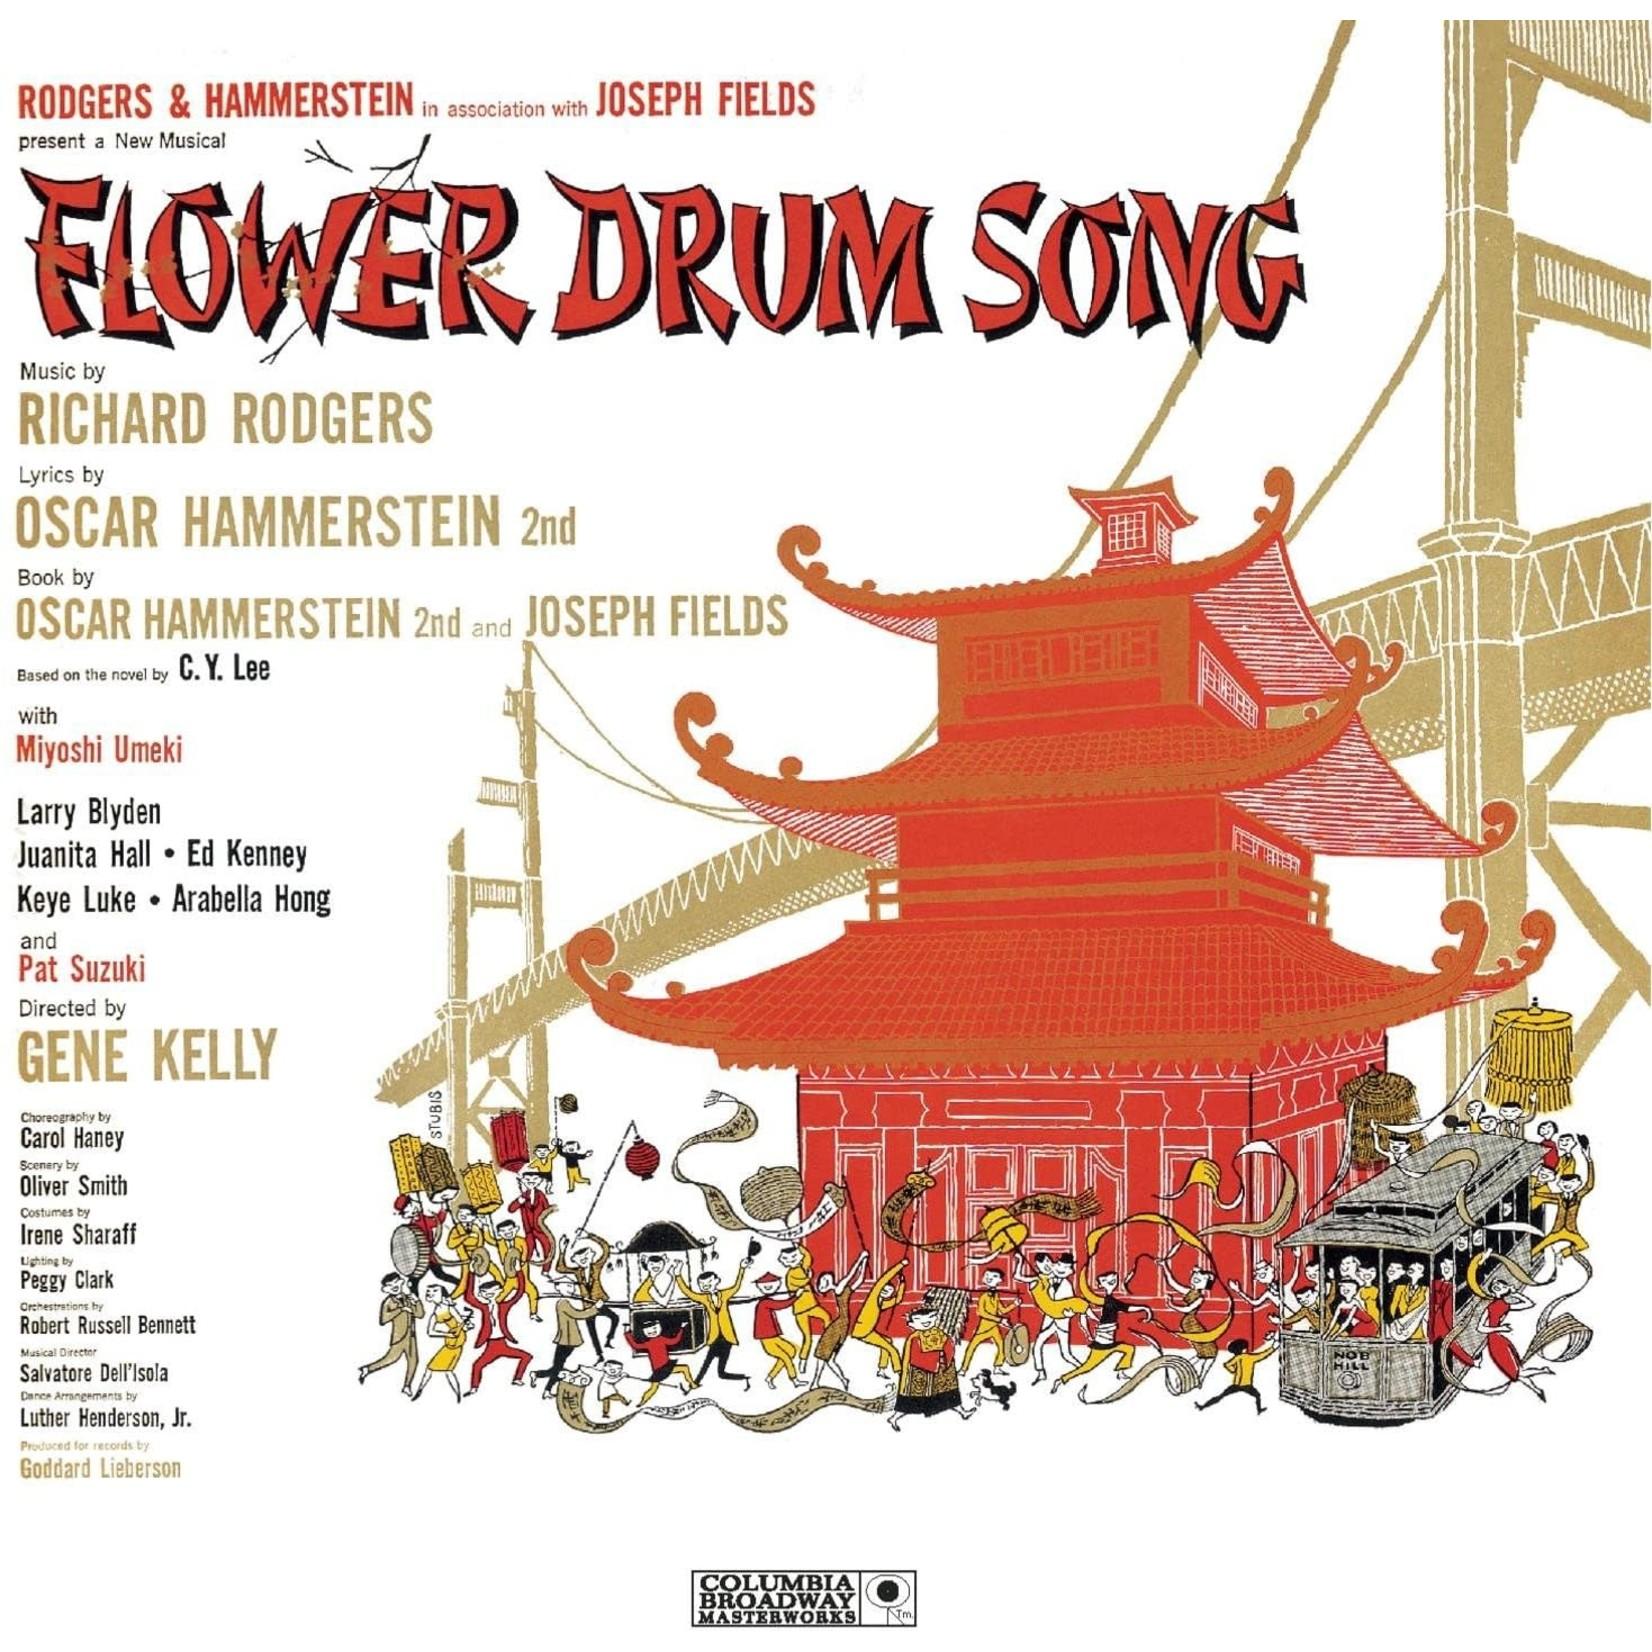 [Vintage] Rodgers & Hammerstein: Flower Drum Song (Soundtrack)